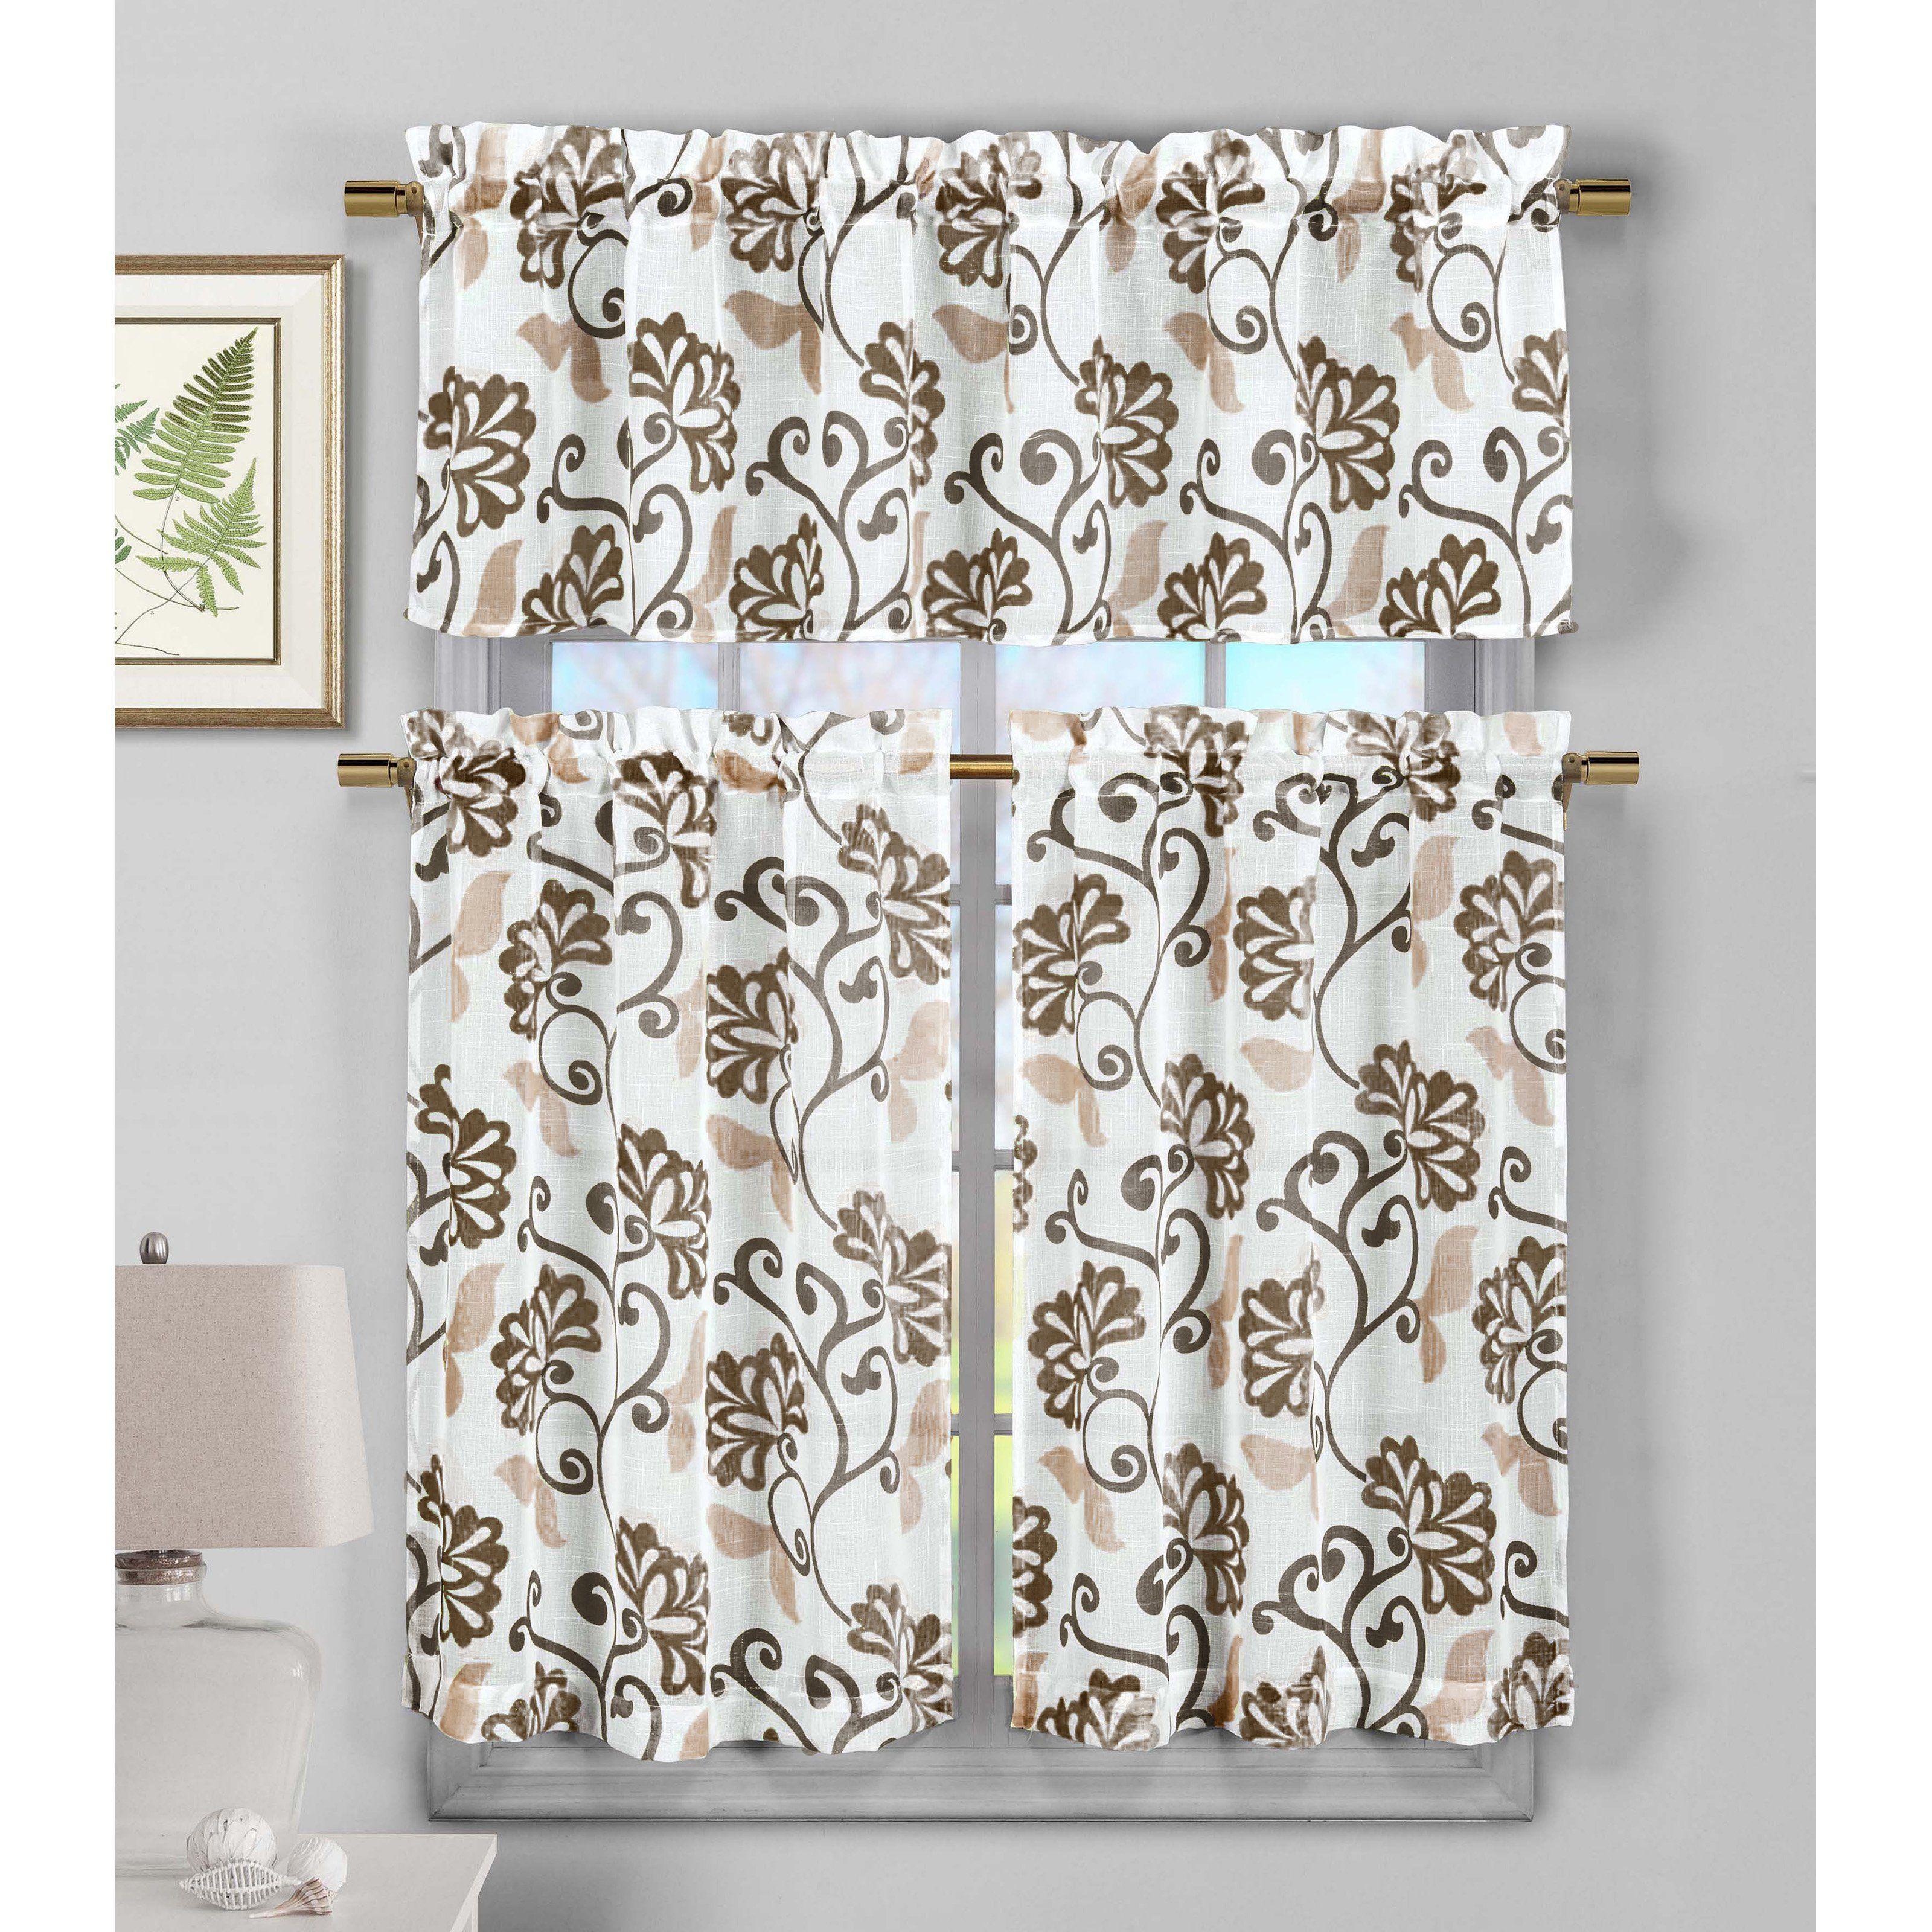 Duck River Rivietta Faux Linen 3 Piece Kitchen Curtain Set